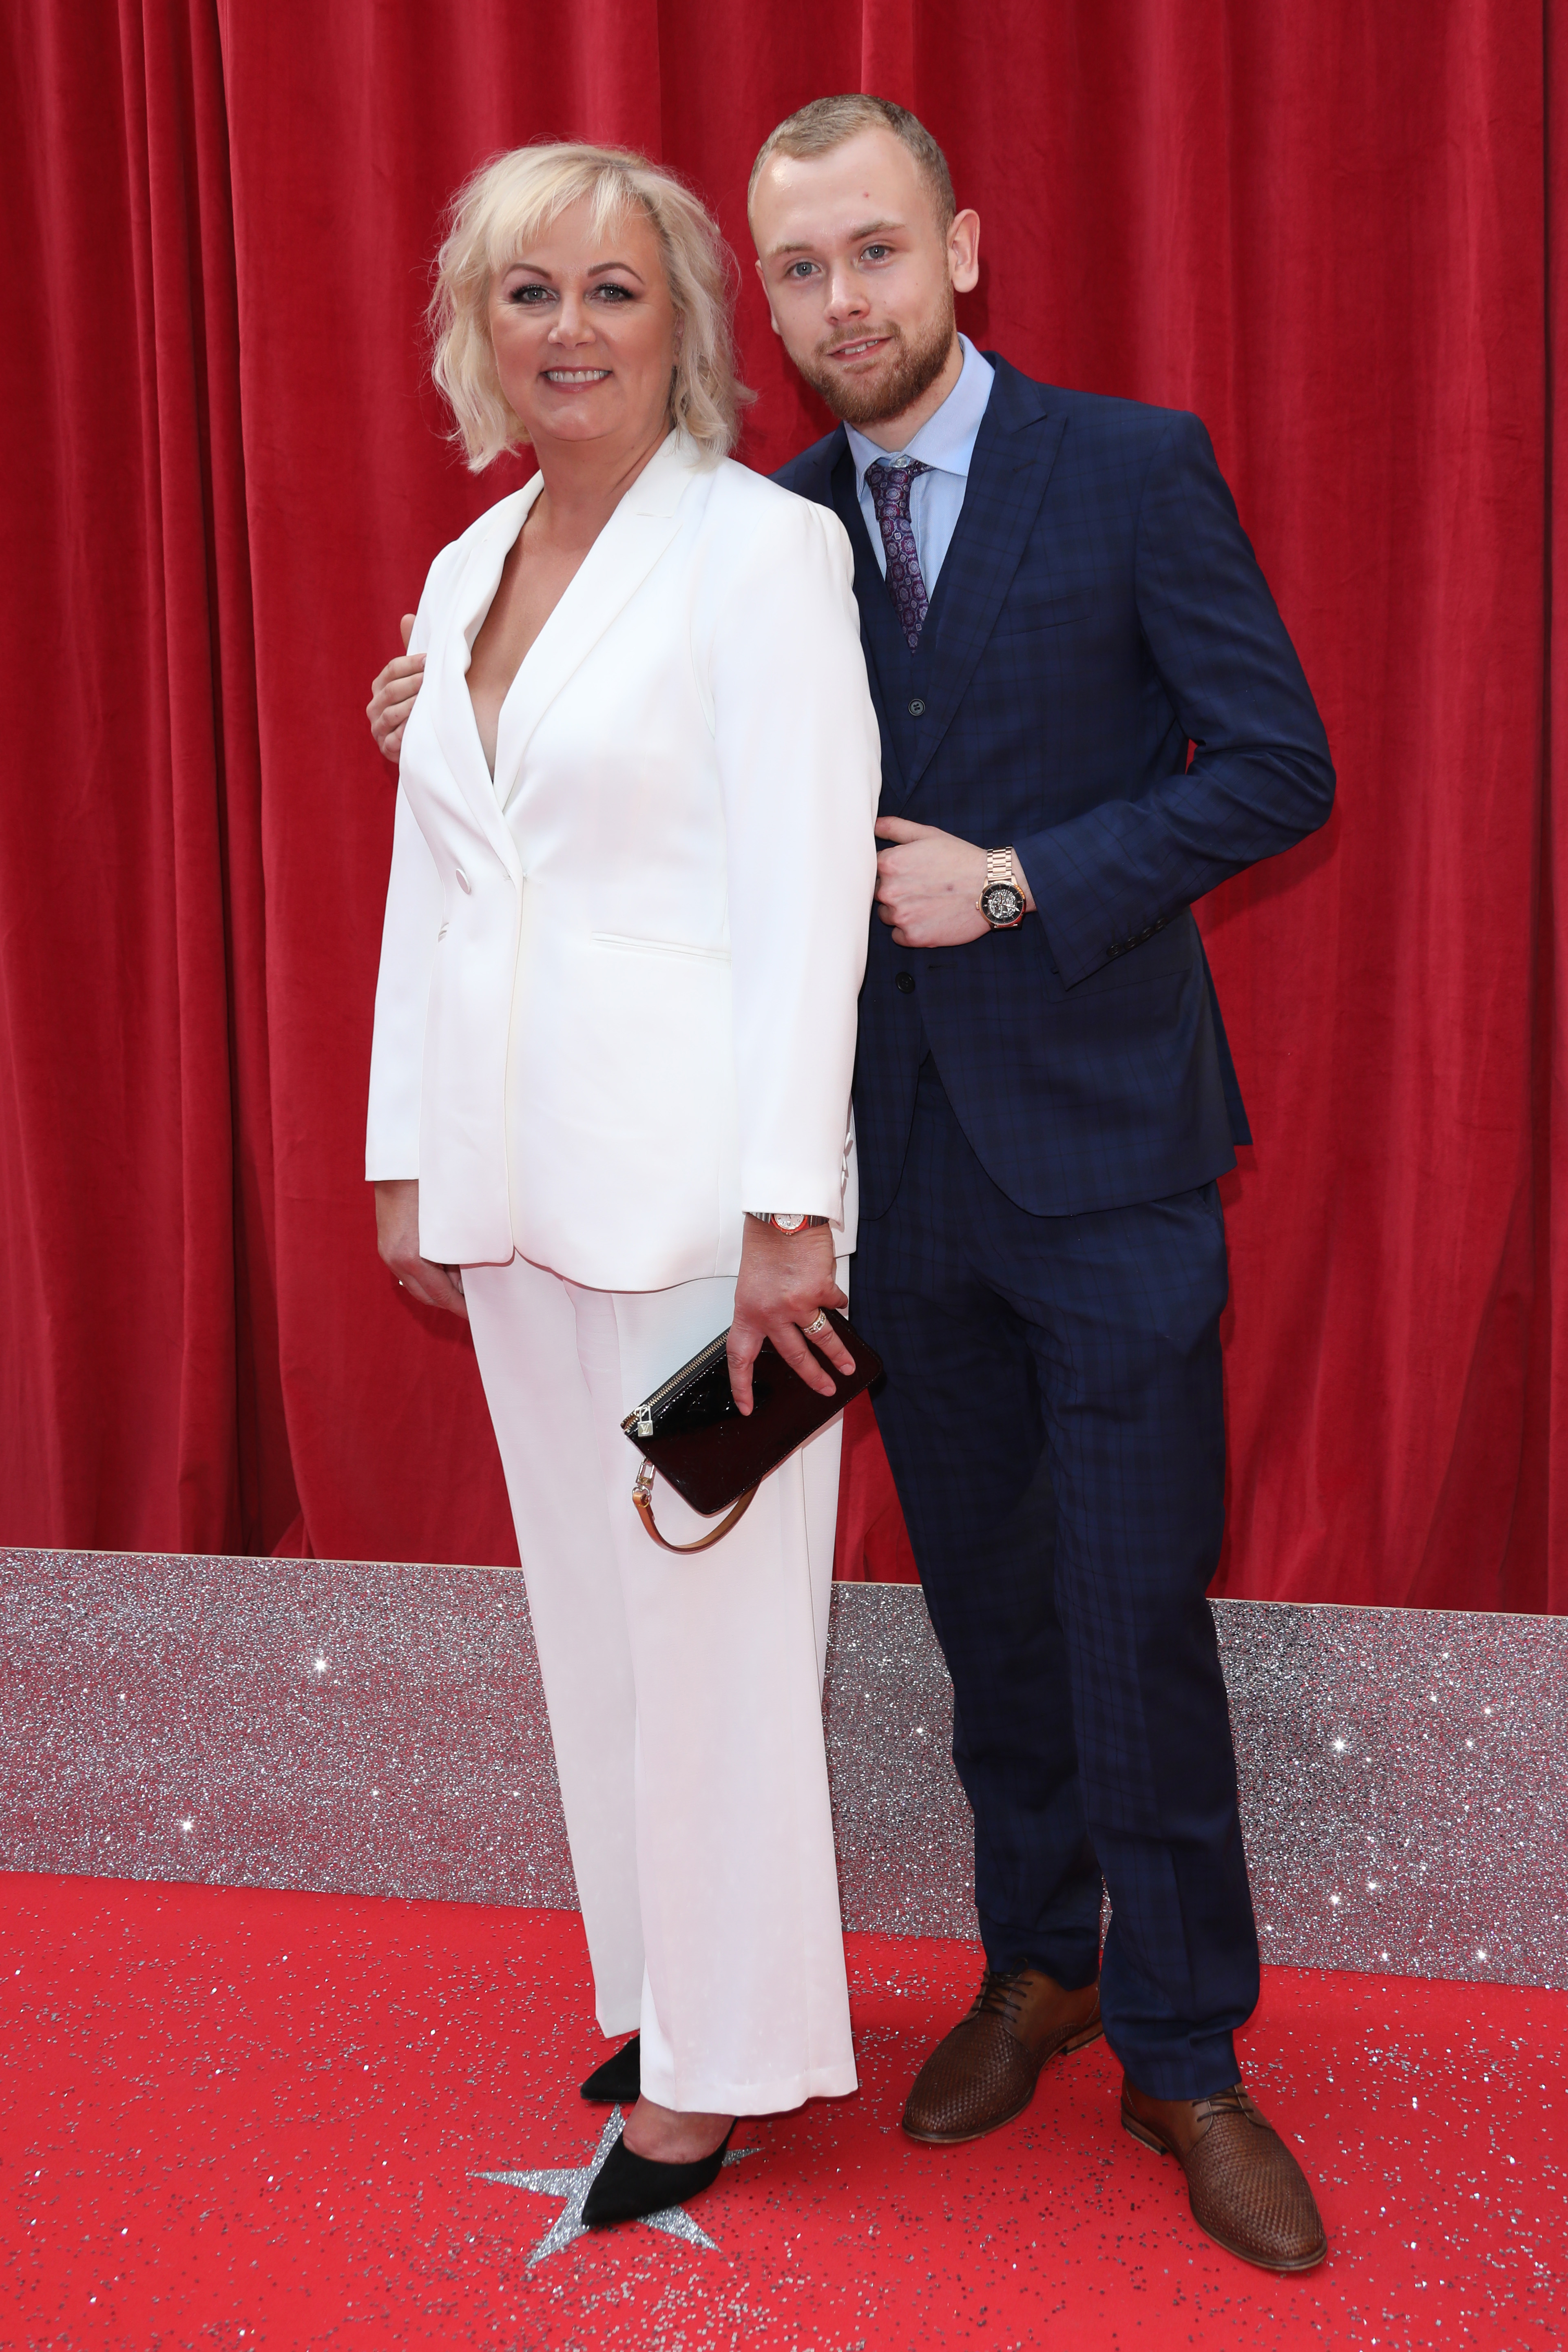 34334593 Headline : The British Soap Awards 2018 Caption : The British Soap Awards 2018 held at the Hackney Empire - Arrivals PersonInImage : Sue Cleaver,Elliot Quinn Credit : Lia Toby/WENN.com